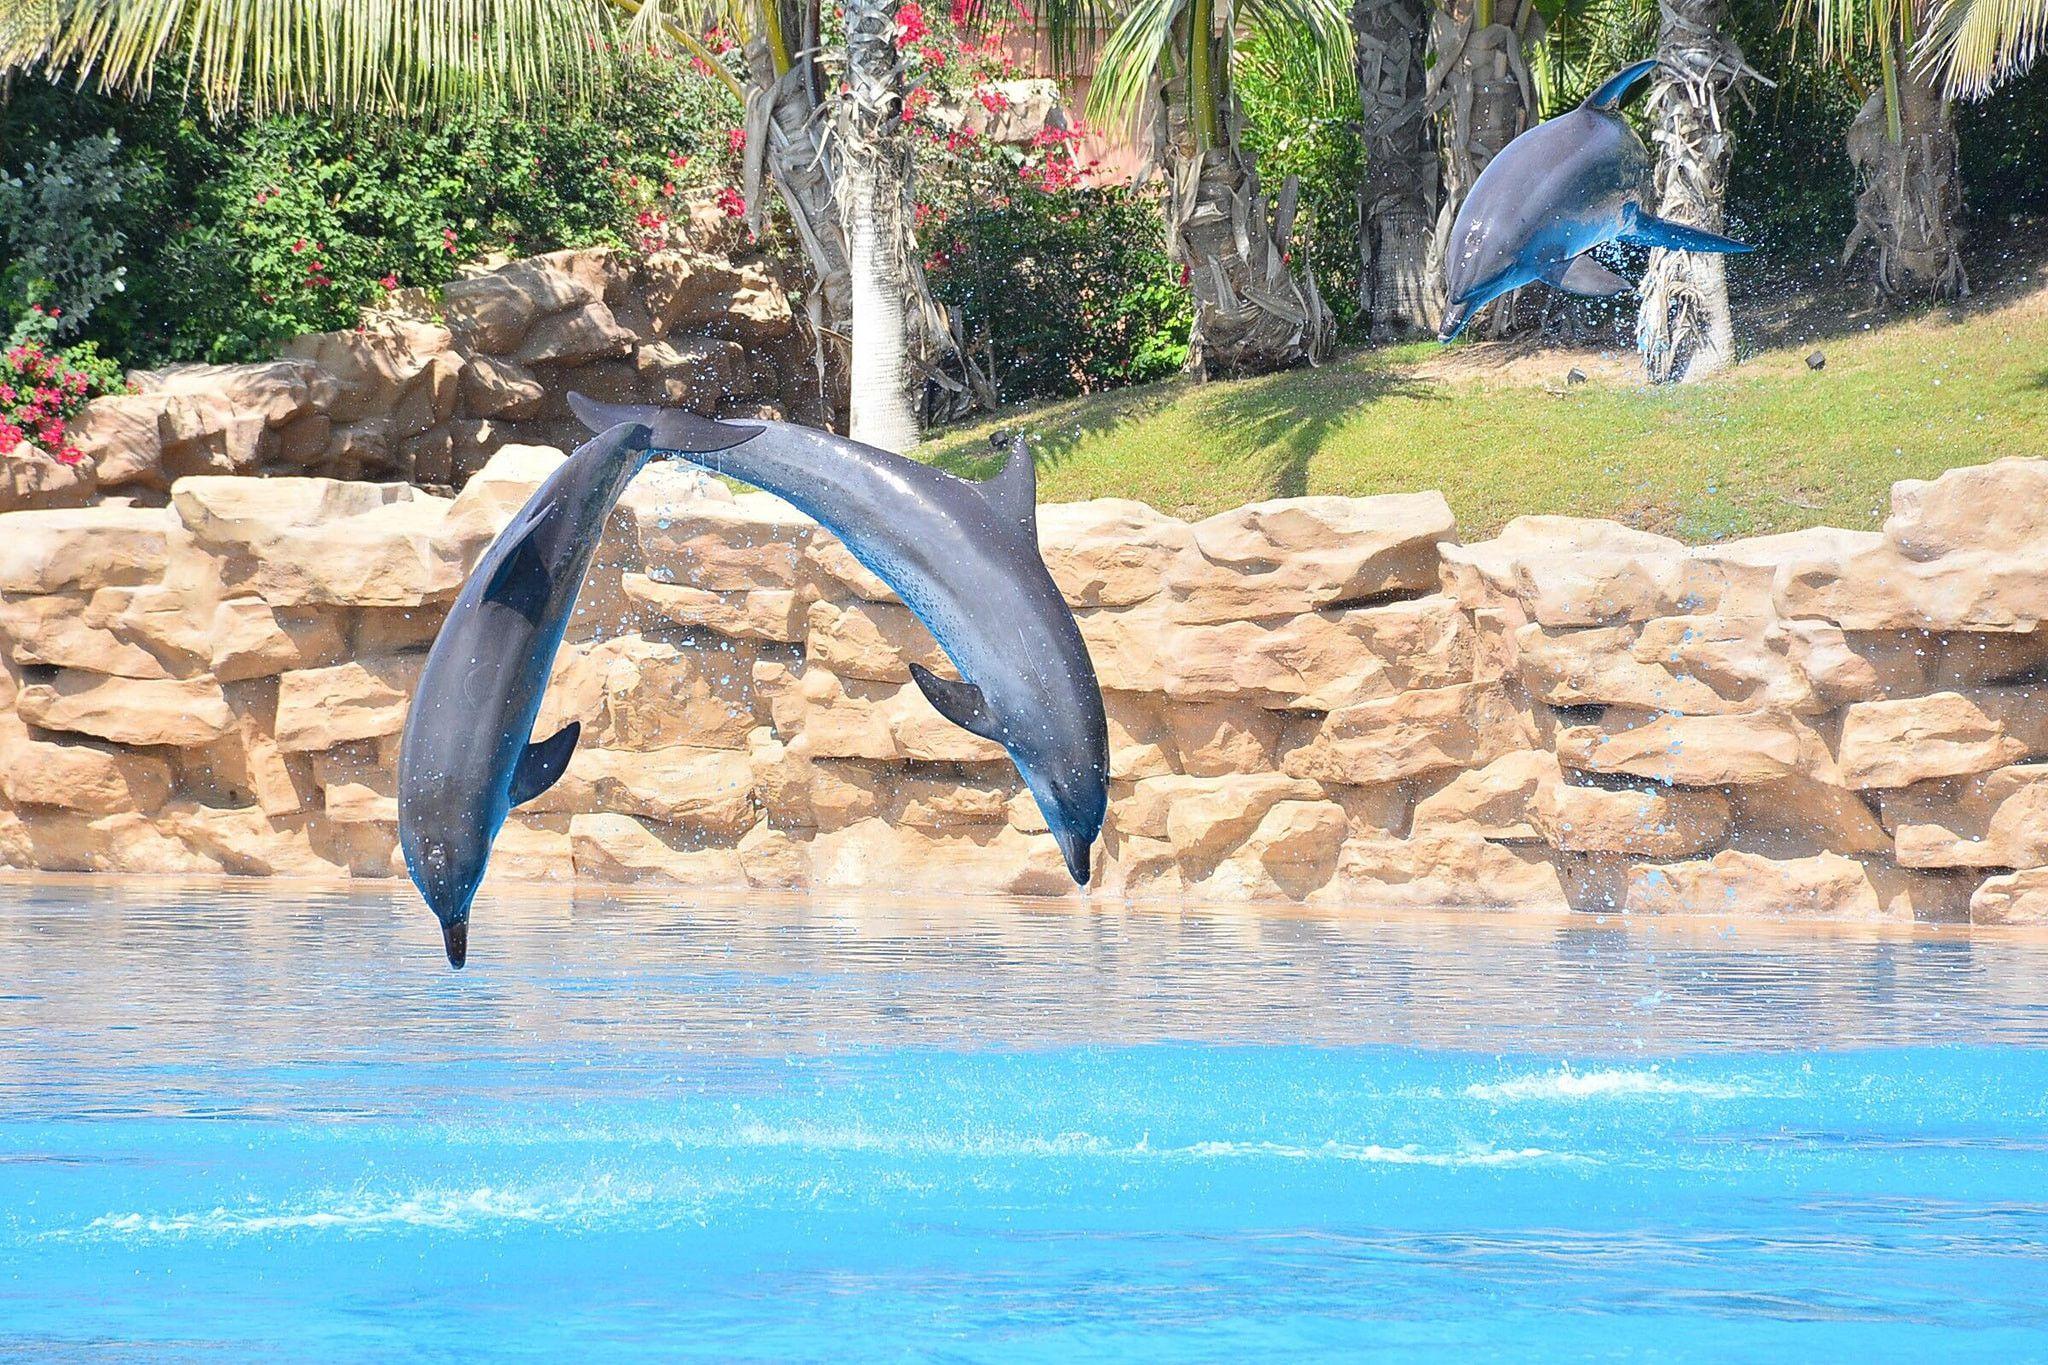 Dolphins jumping through the air